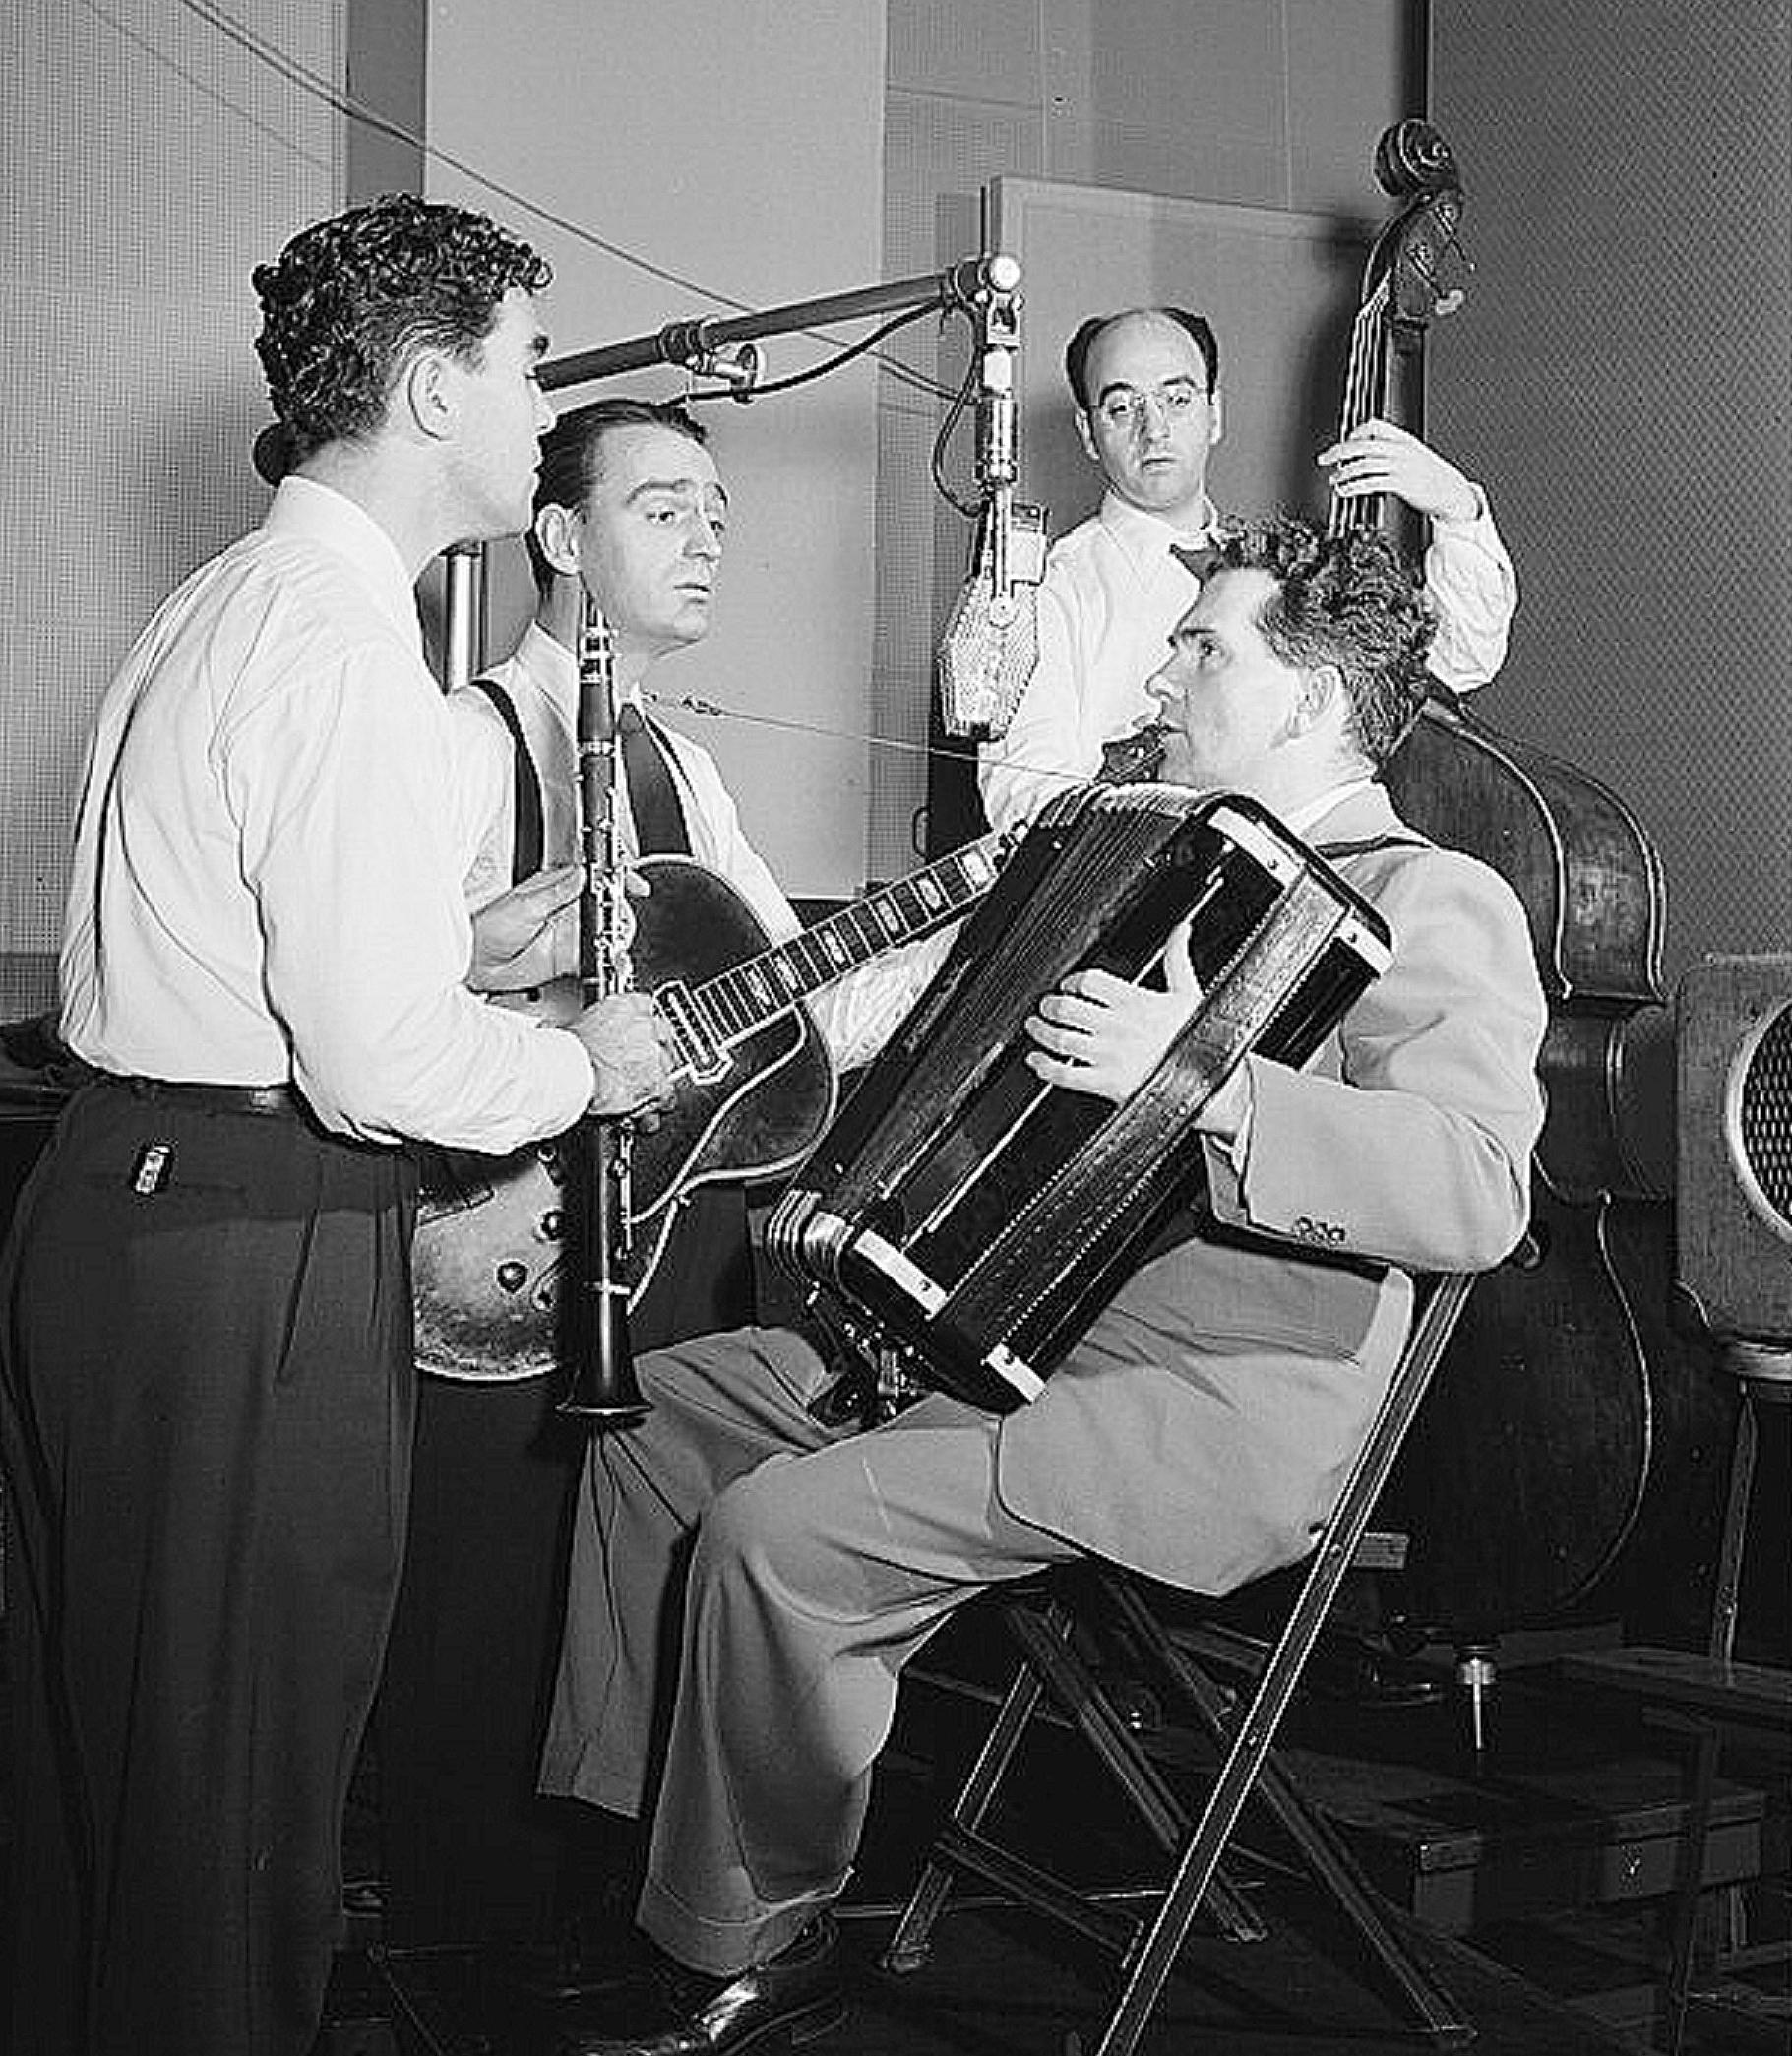 Joe Mooney and Band at Decca Studios 1946